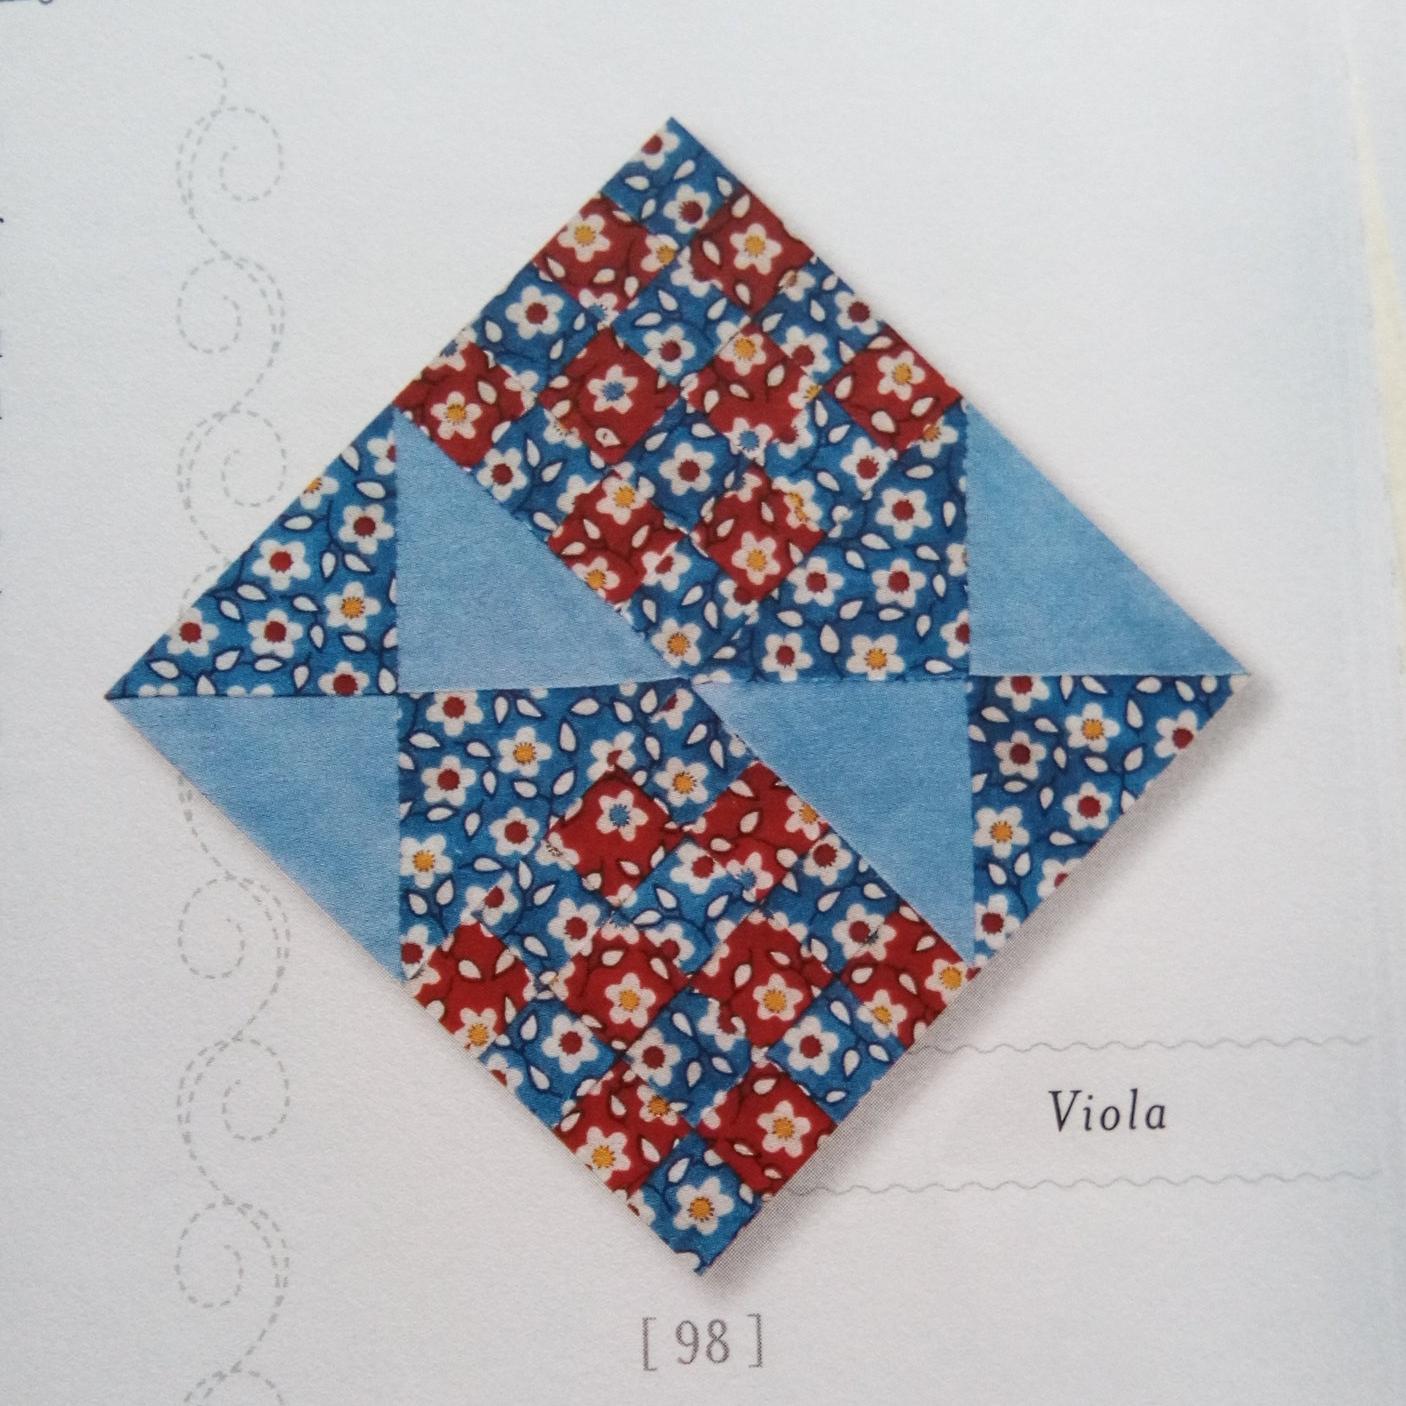 Viola: Coming October 29